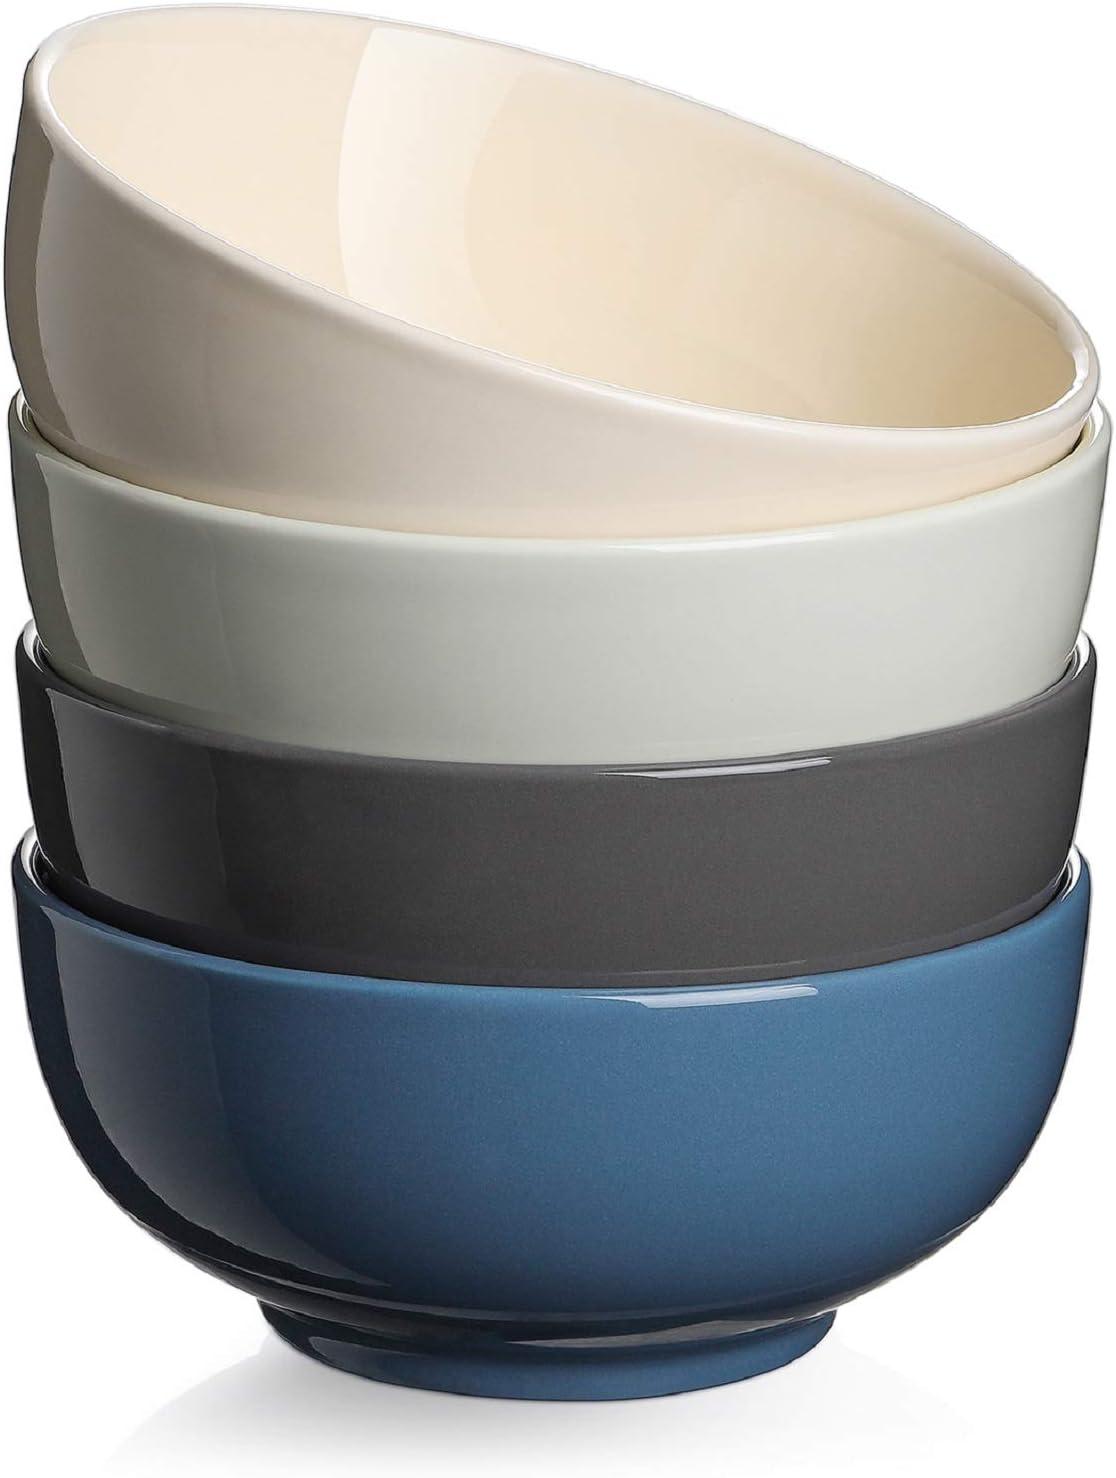 DOWAN Soup Bowls for List price Kitchen - Ranking TOP1 Oz Servin Large 22 Porcelain